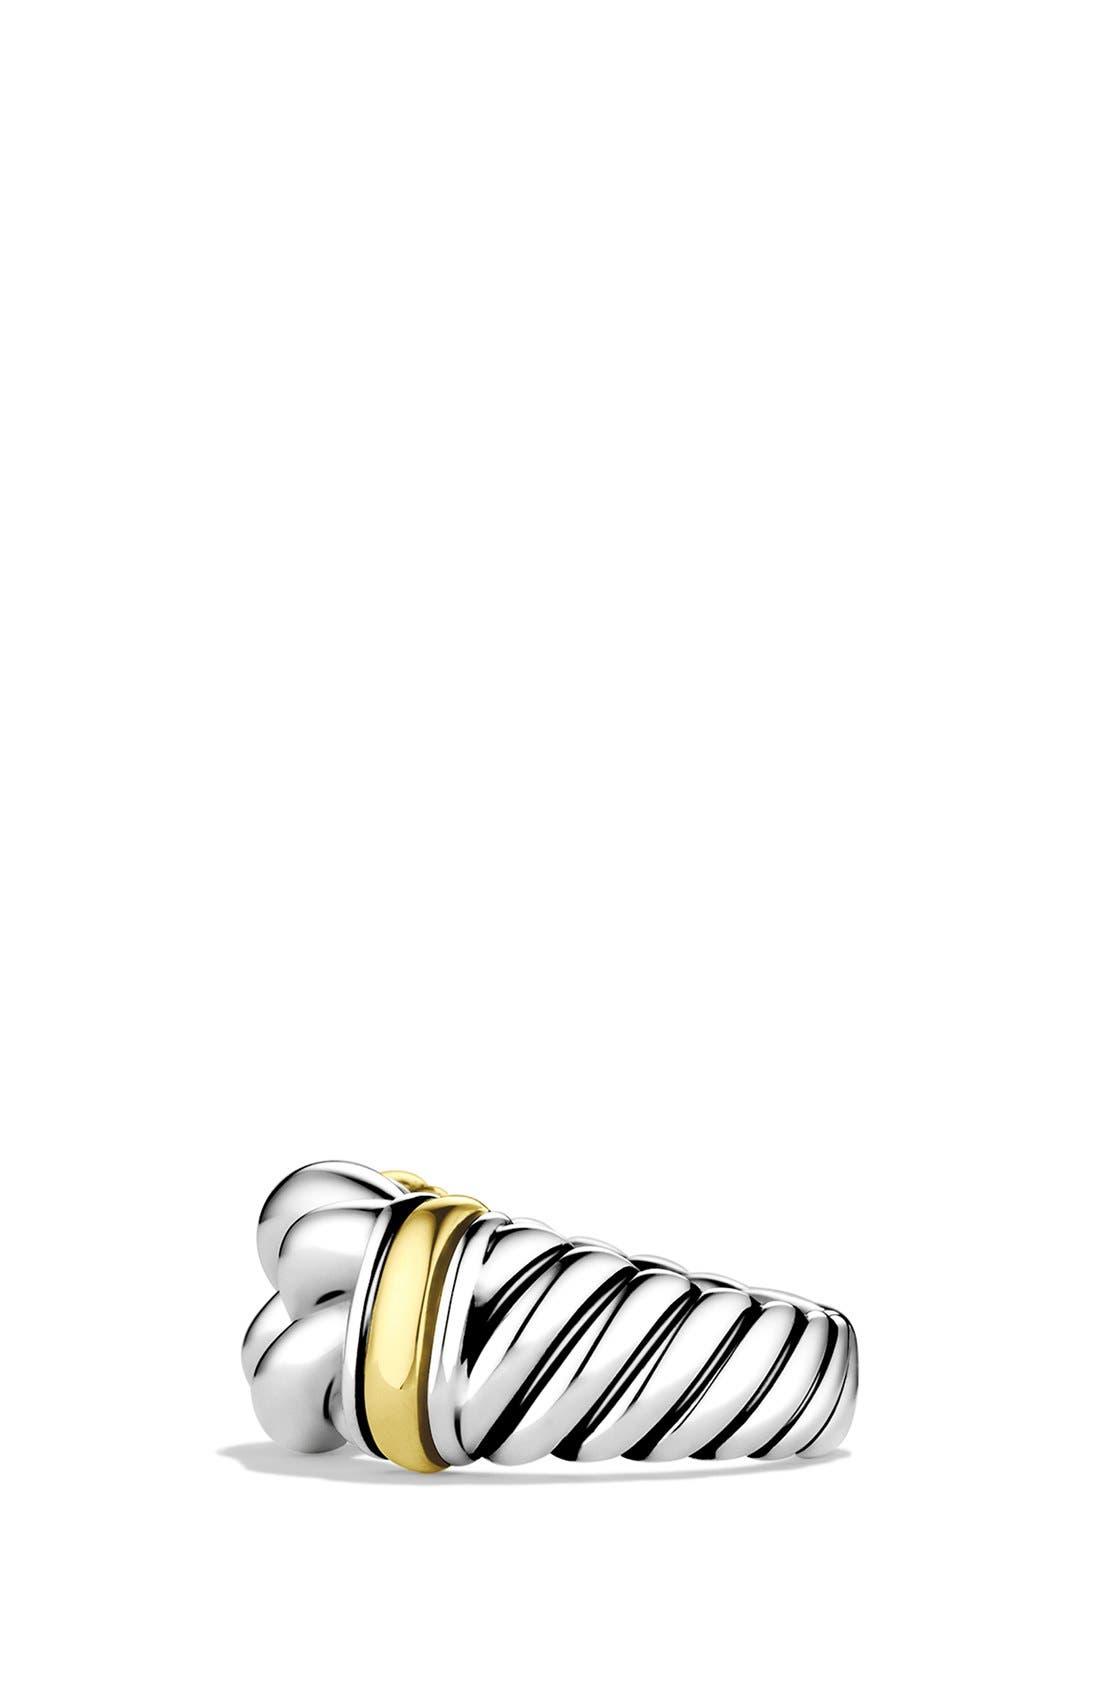 DAVID YURMAN,                             'Metro' Ring with Gold,                             Alternate thumbnail 3, color,                             040